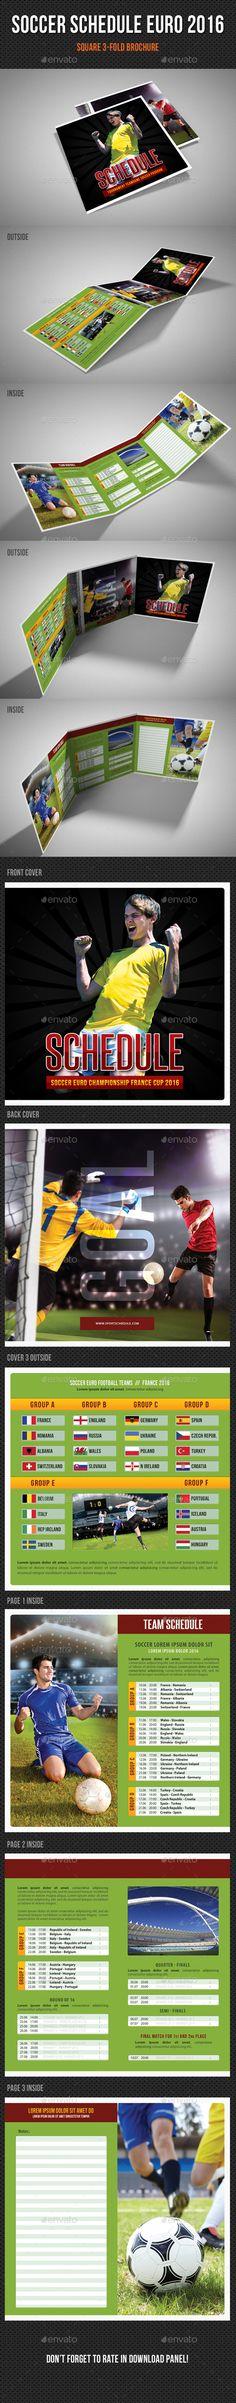 Soccer Schedule Euro 2016 Square 3-Fold Brochure